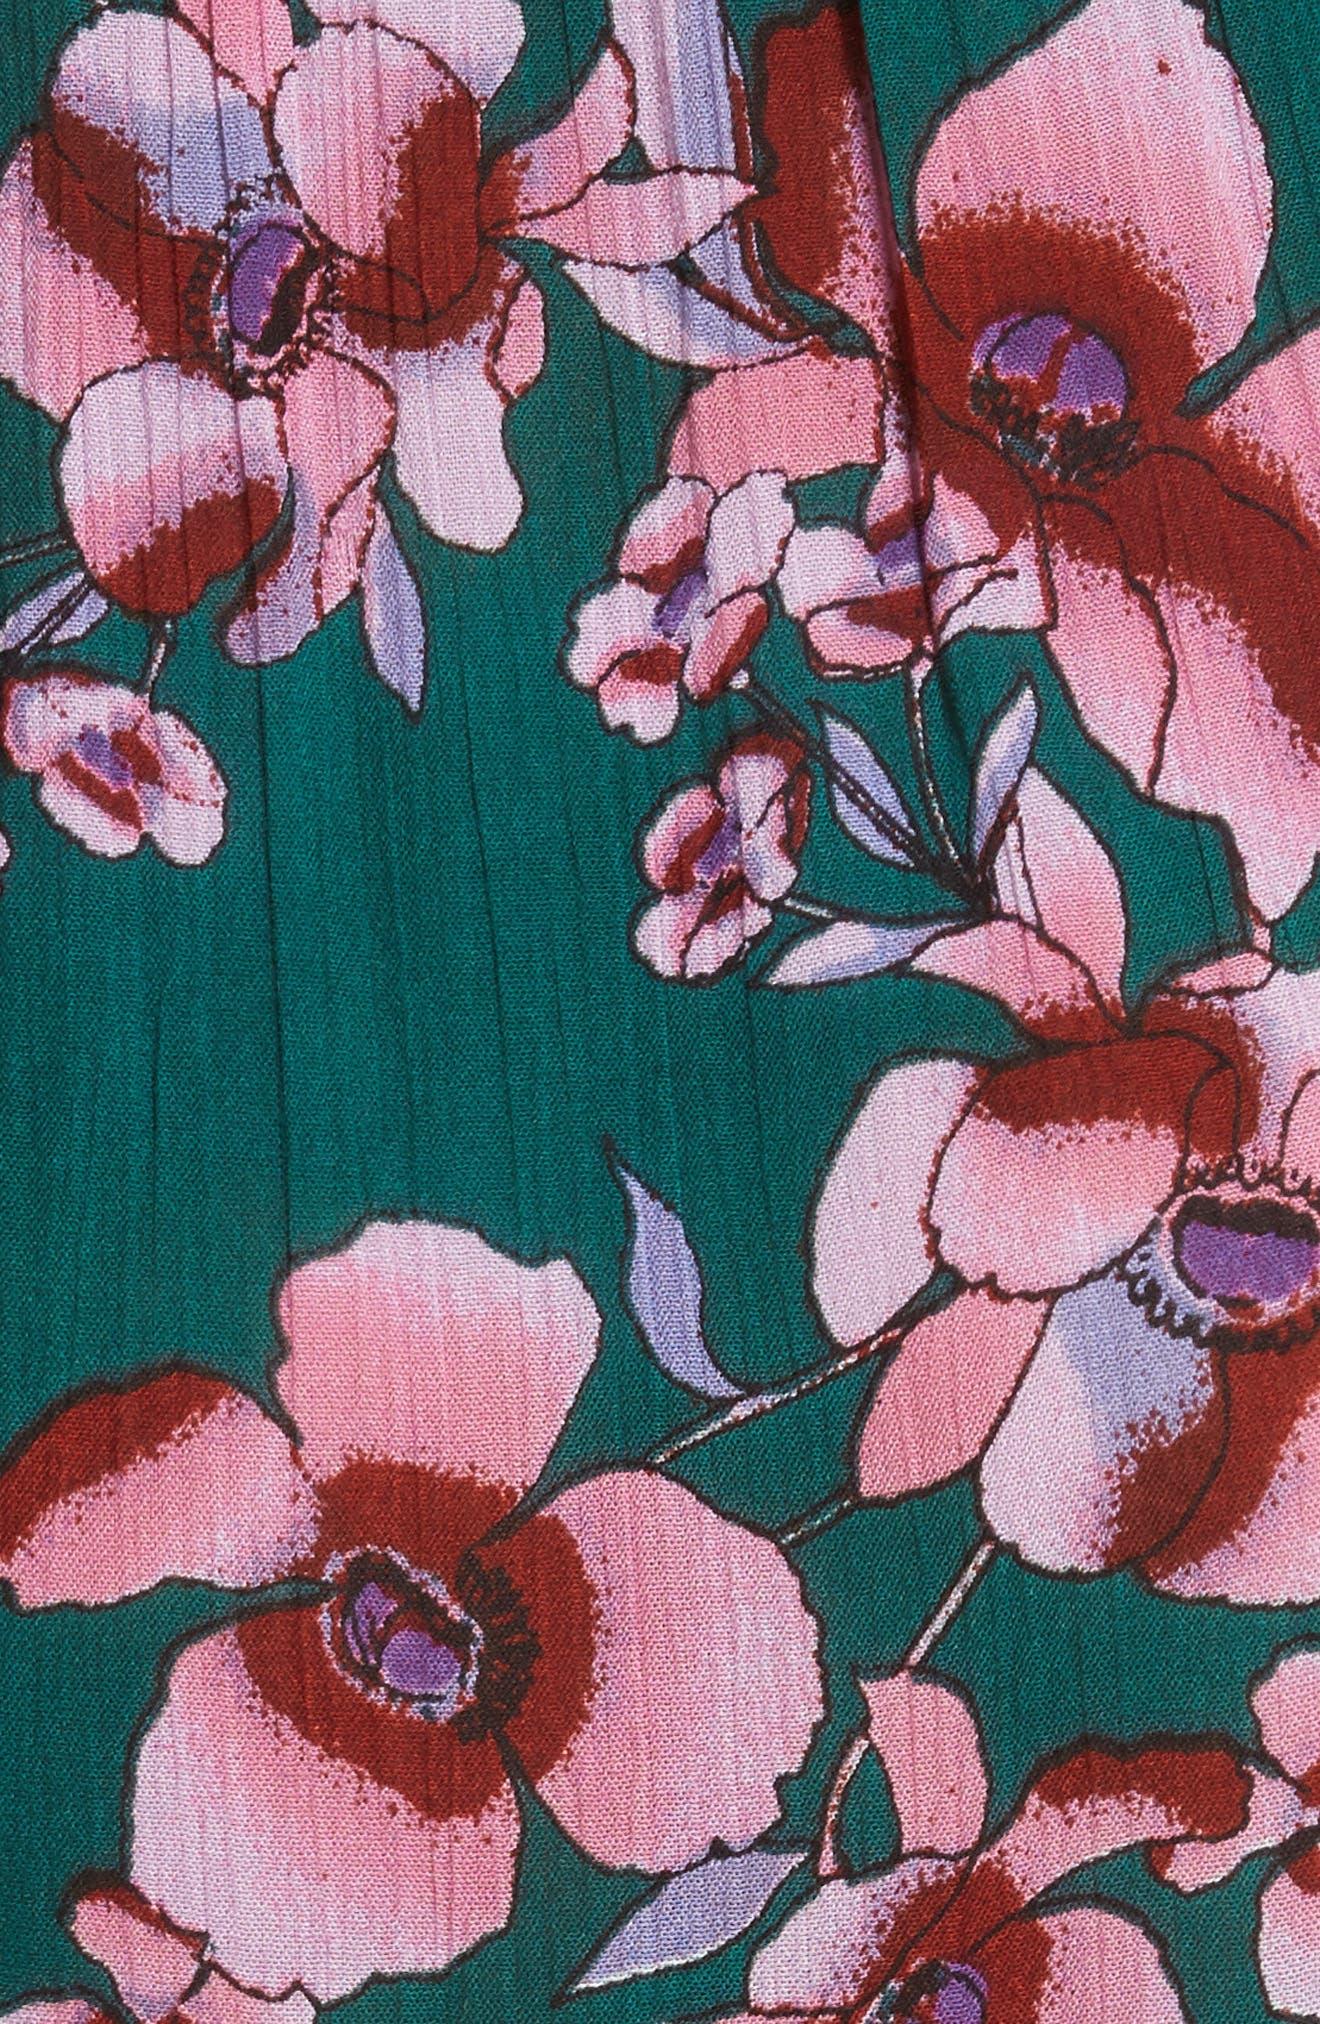 Garden Party Maxi Dress,                             Alternate thumbnail 5, color,                             Turquoise